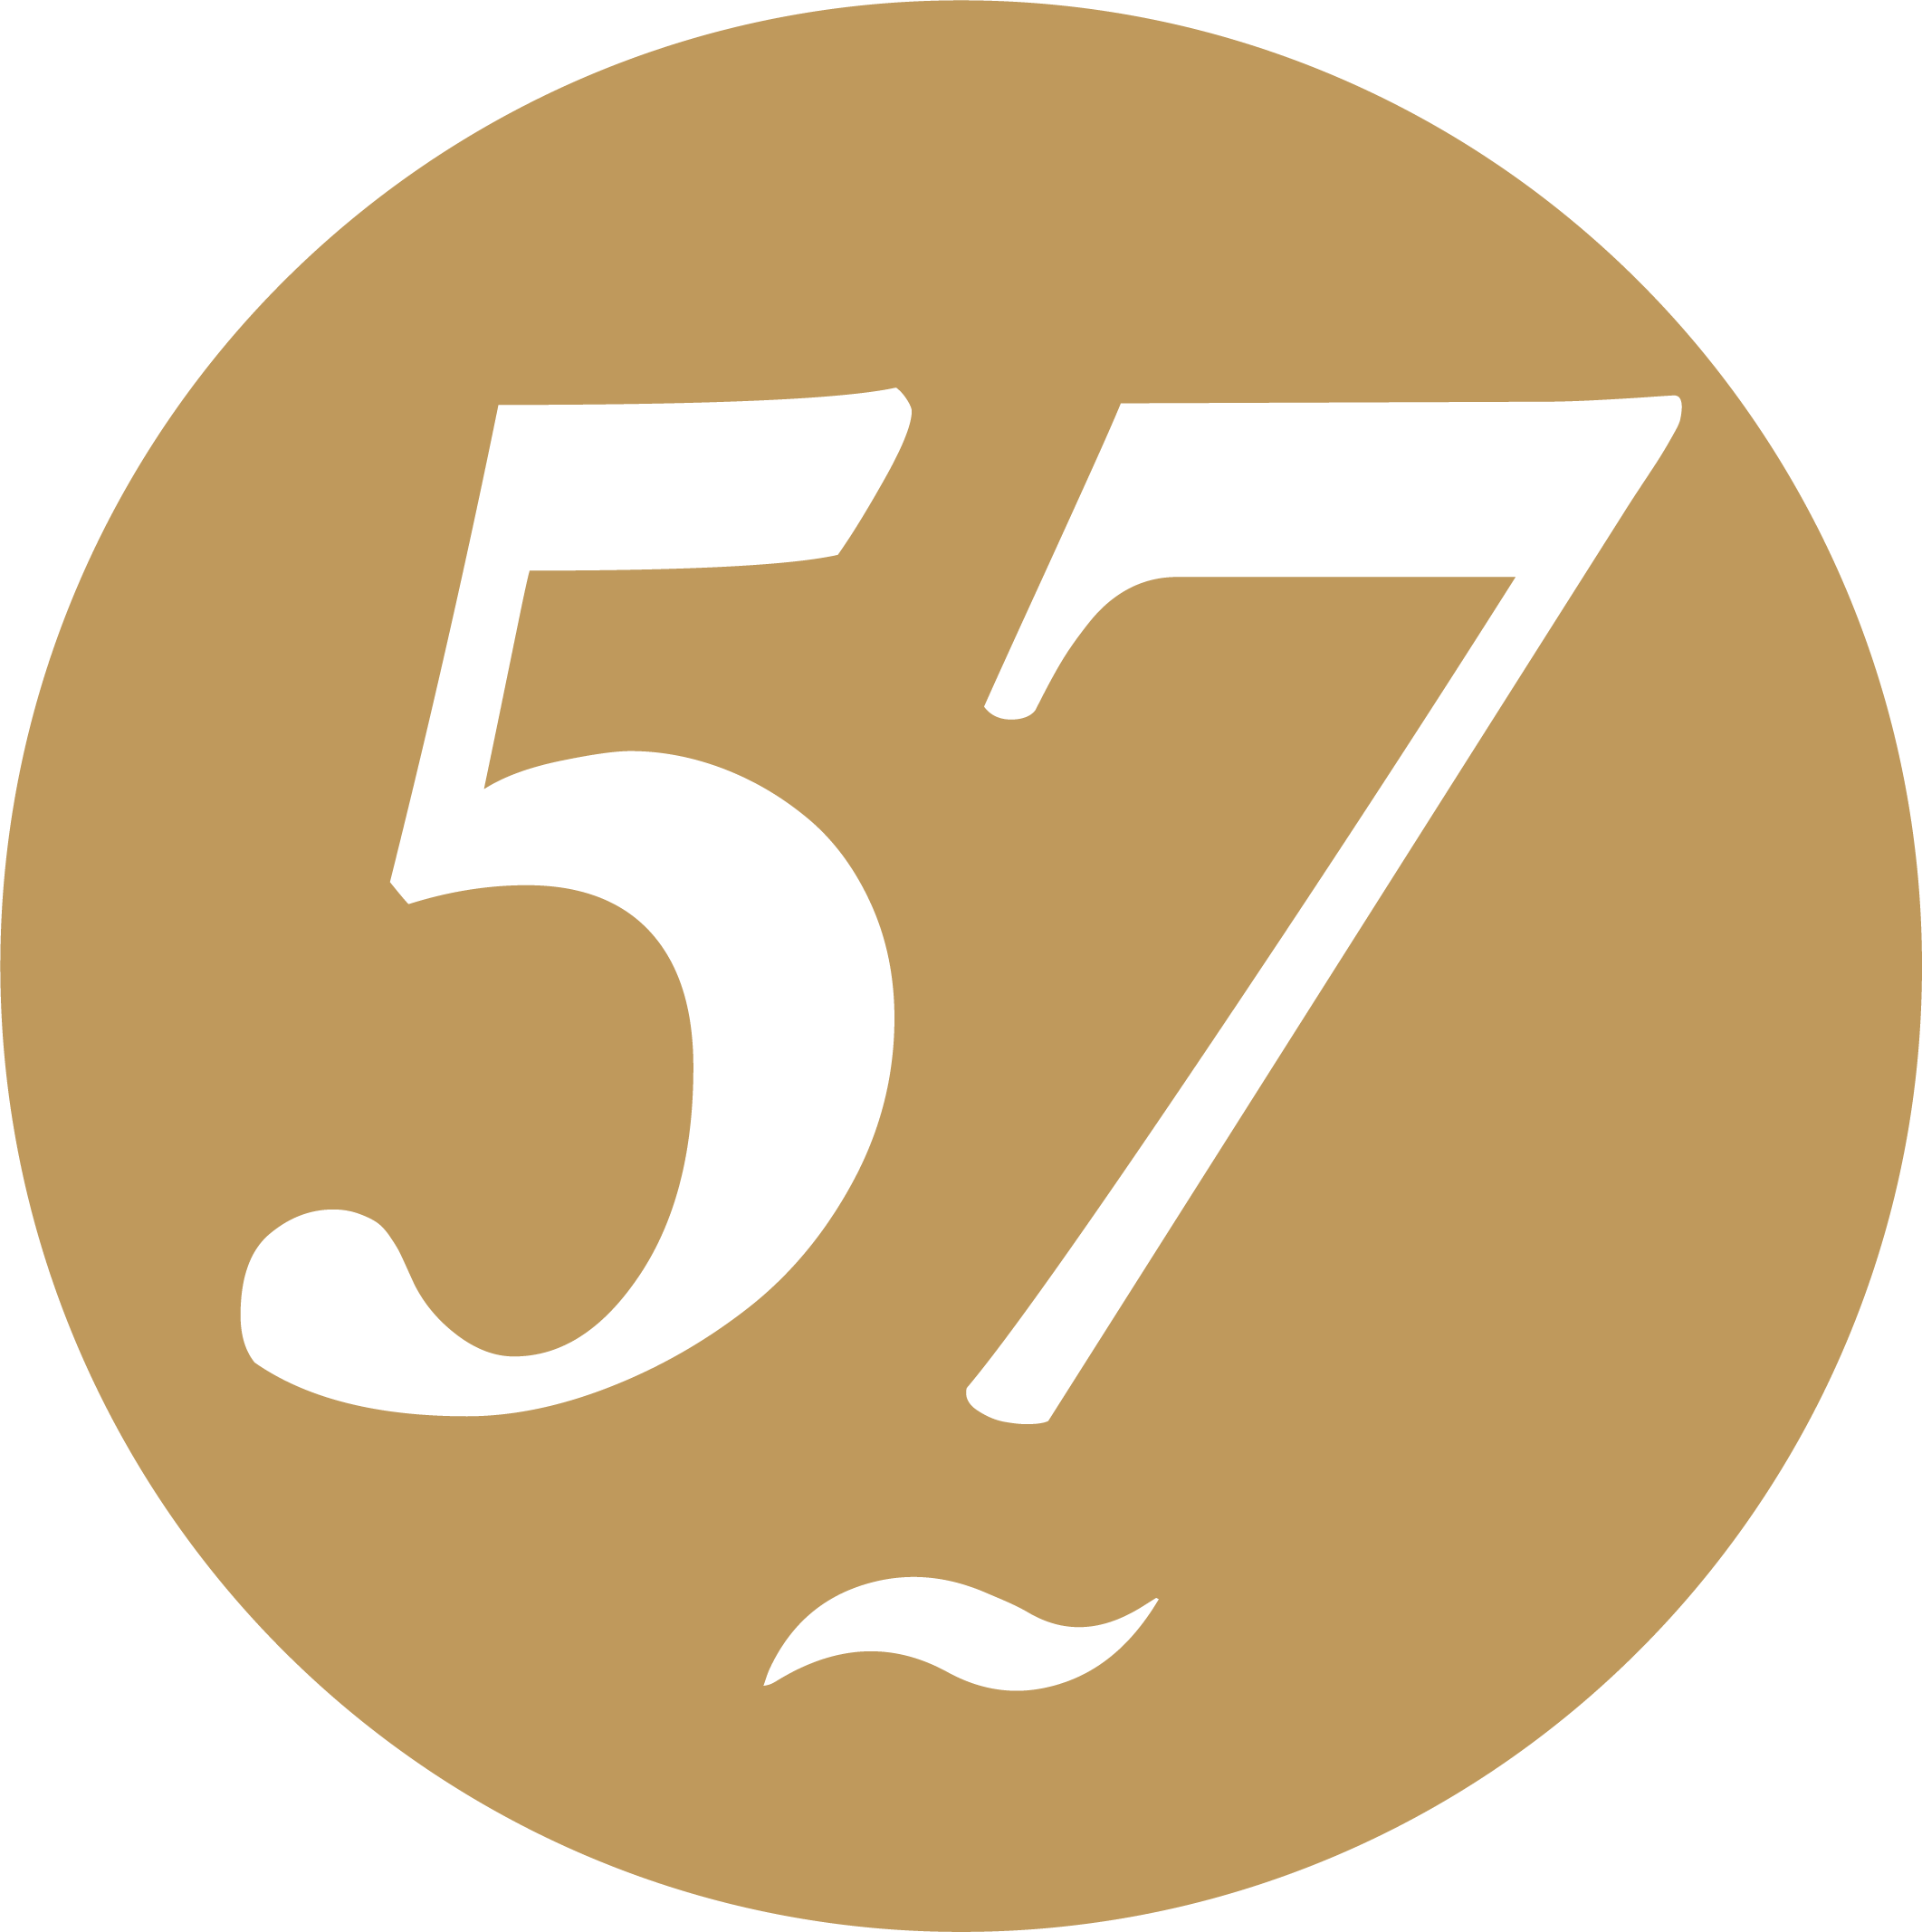 Number 57 favicon